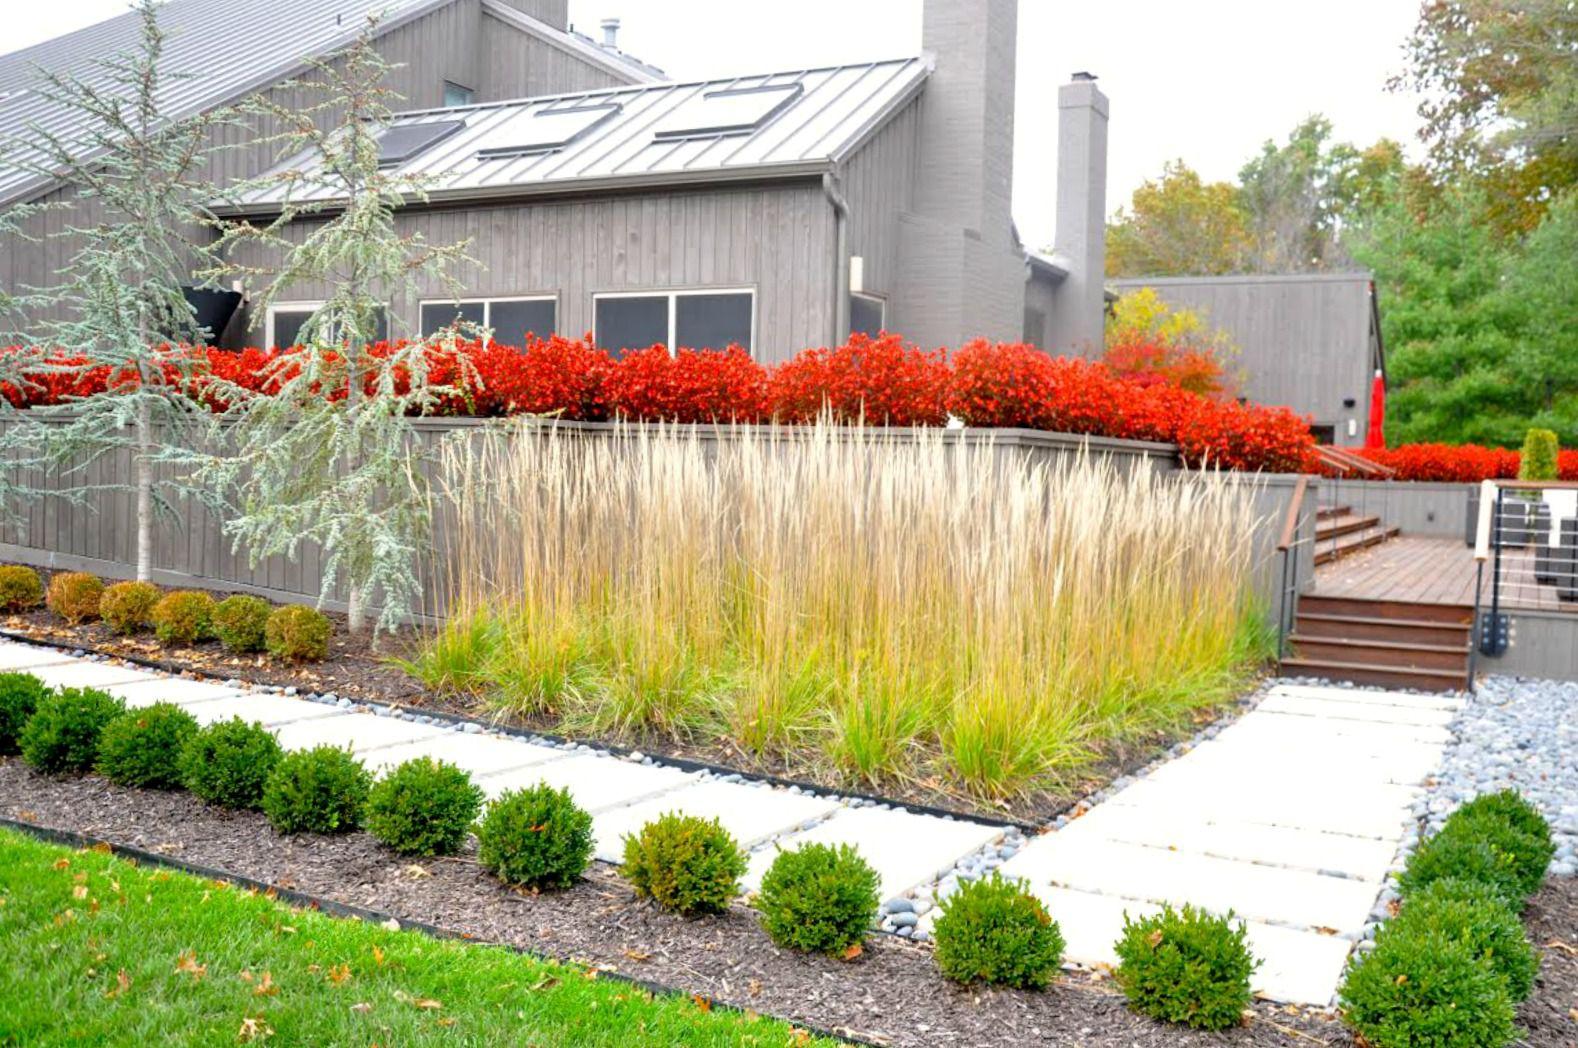 50 Backyard Landscaping Ideas